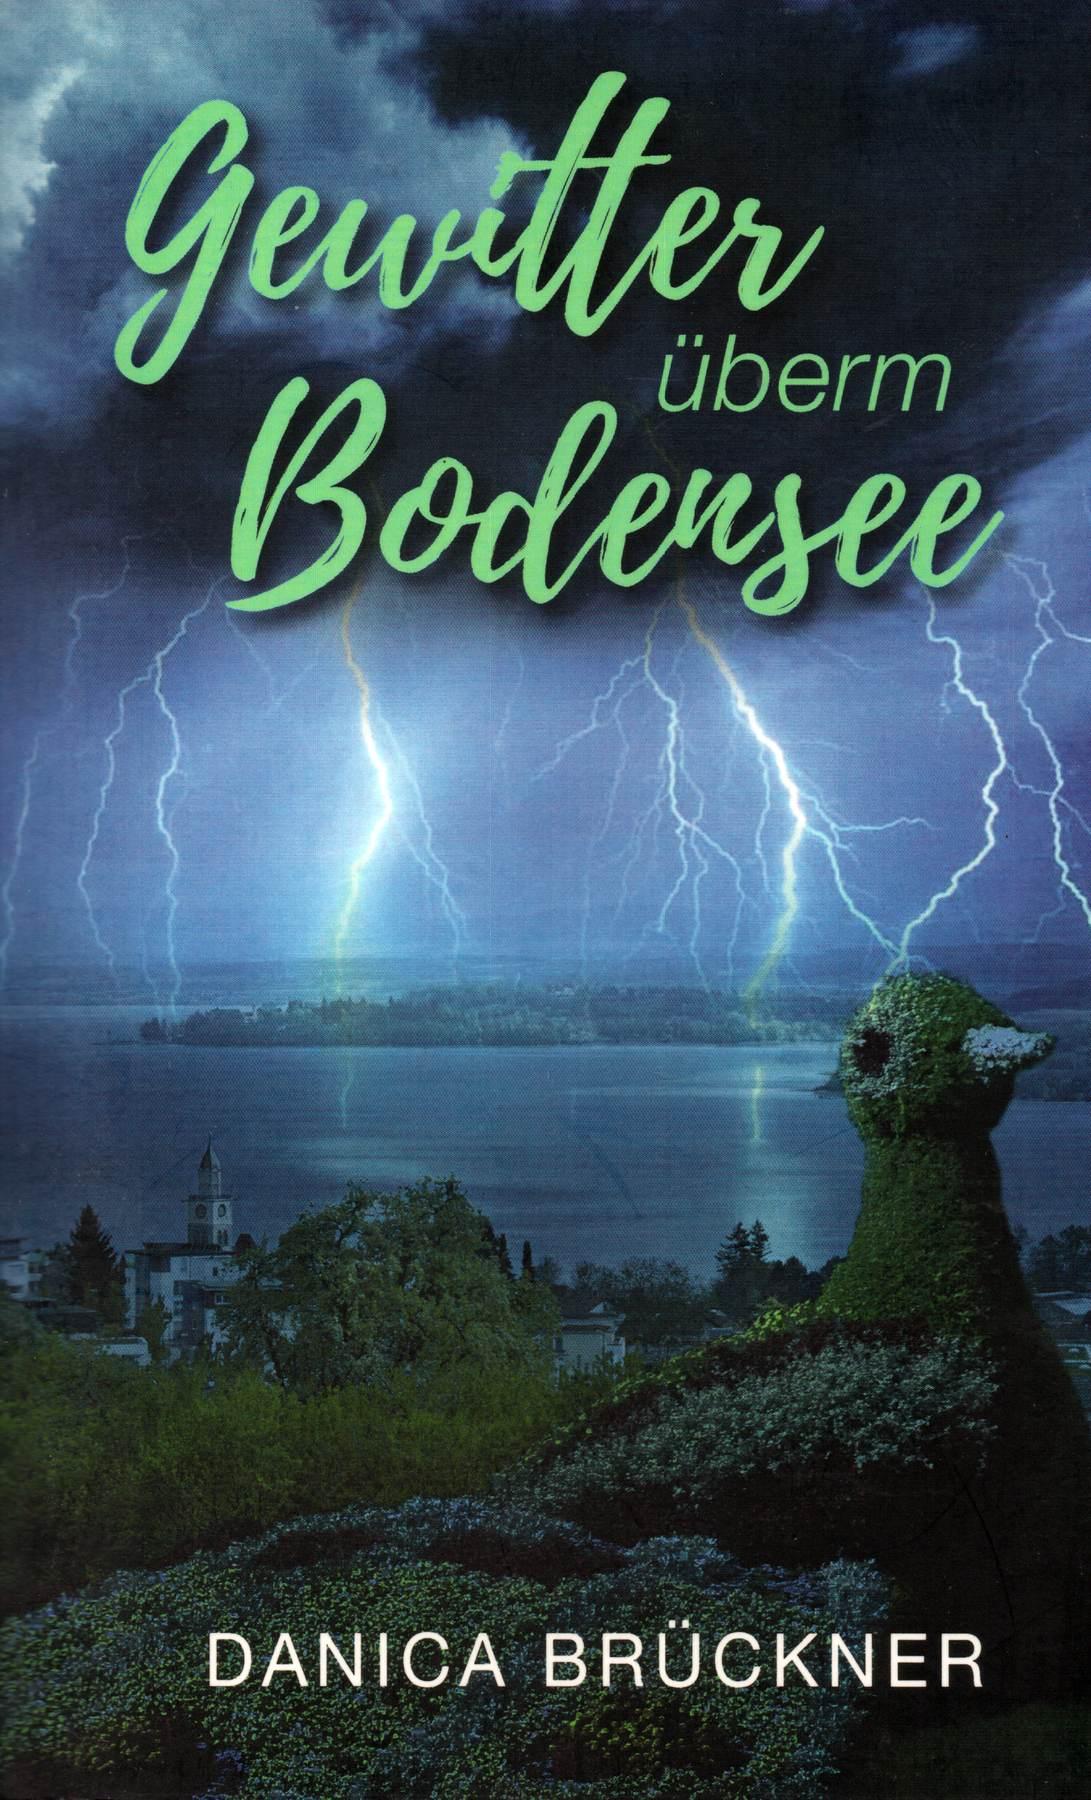 Danica Brückner - Gewitter üeberm Bodensee